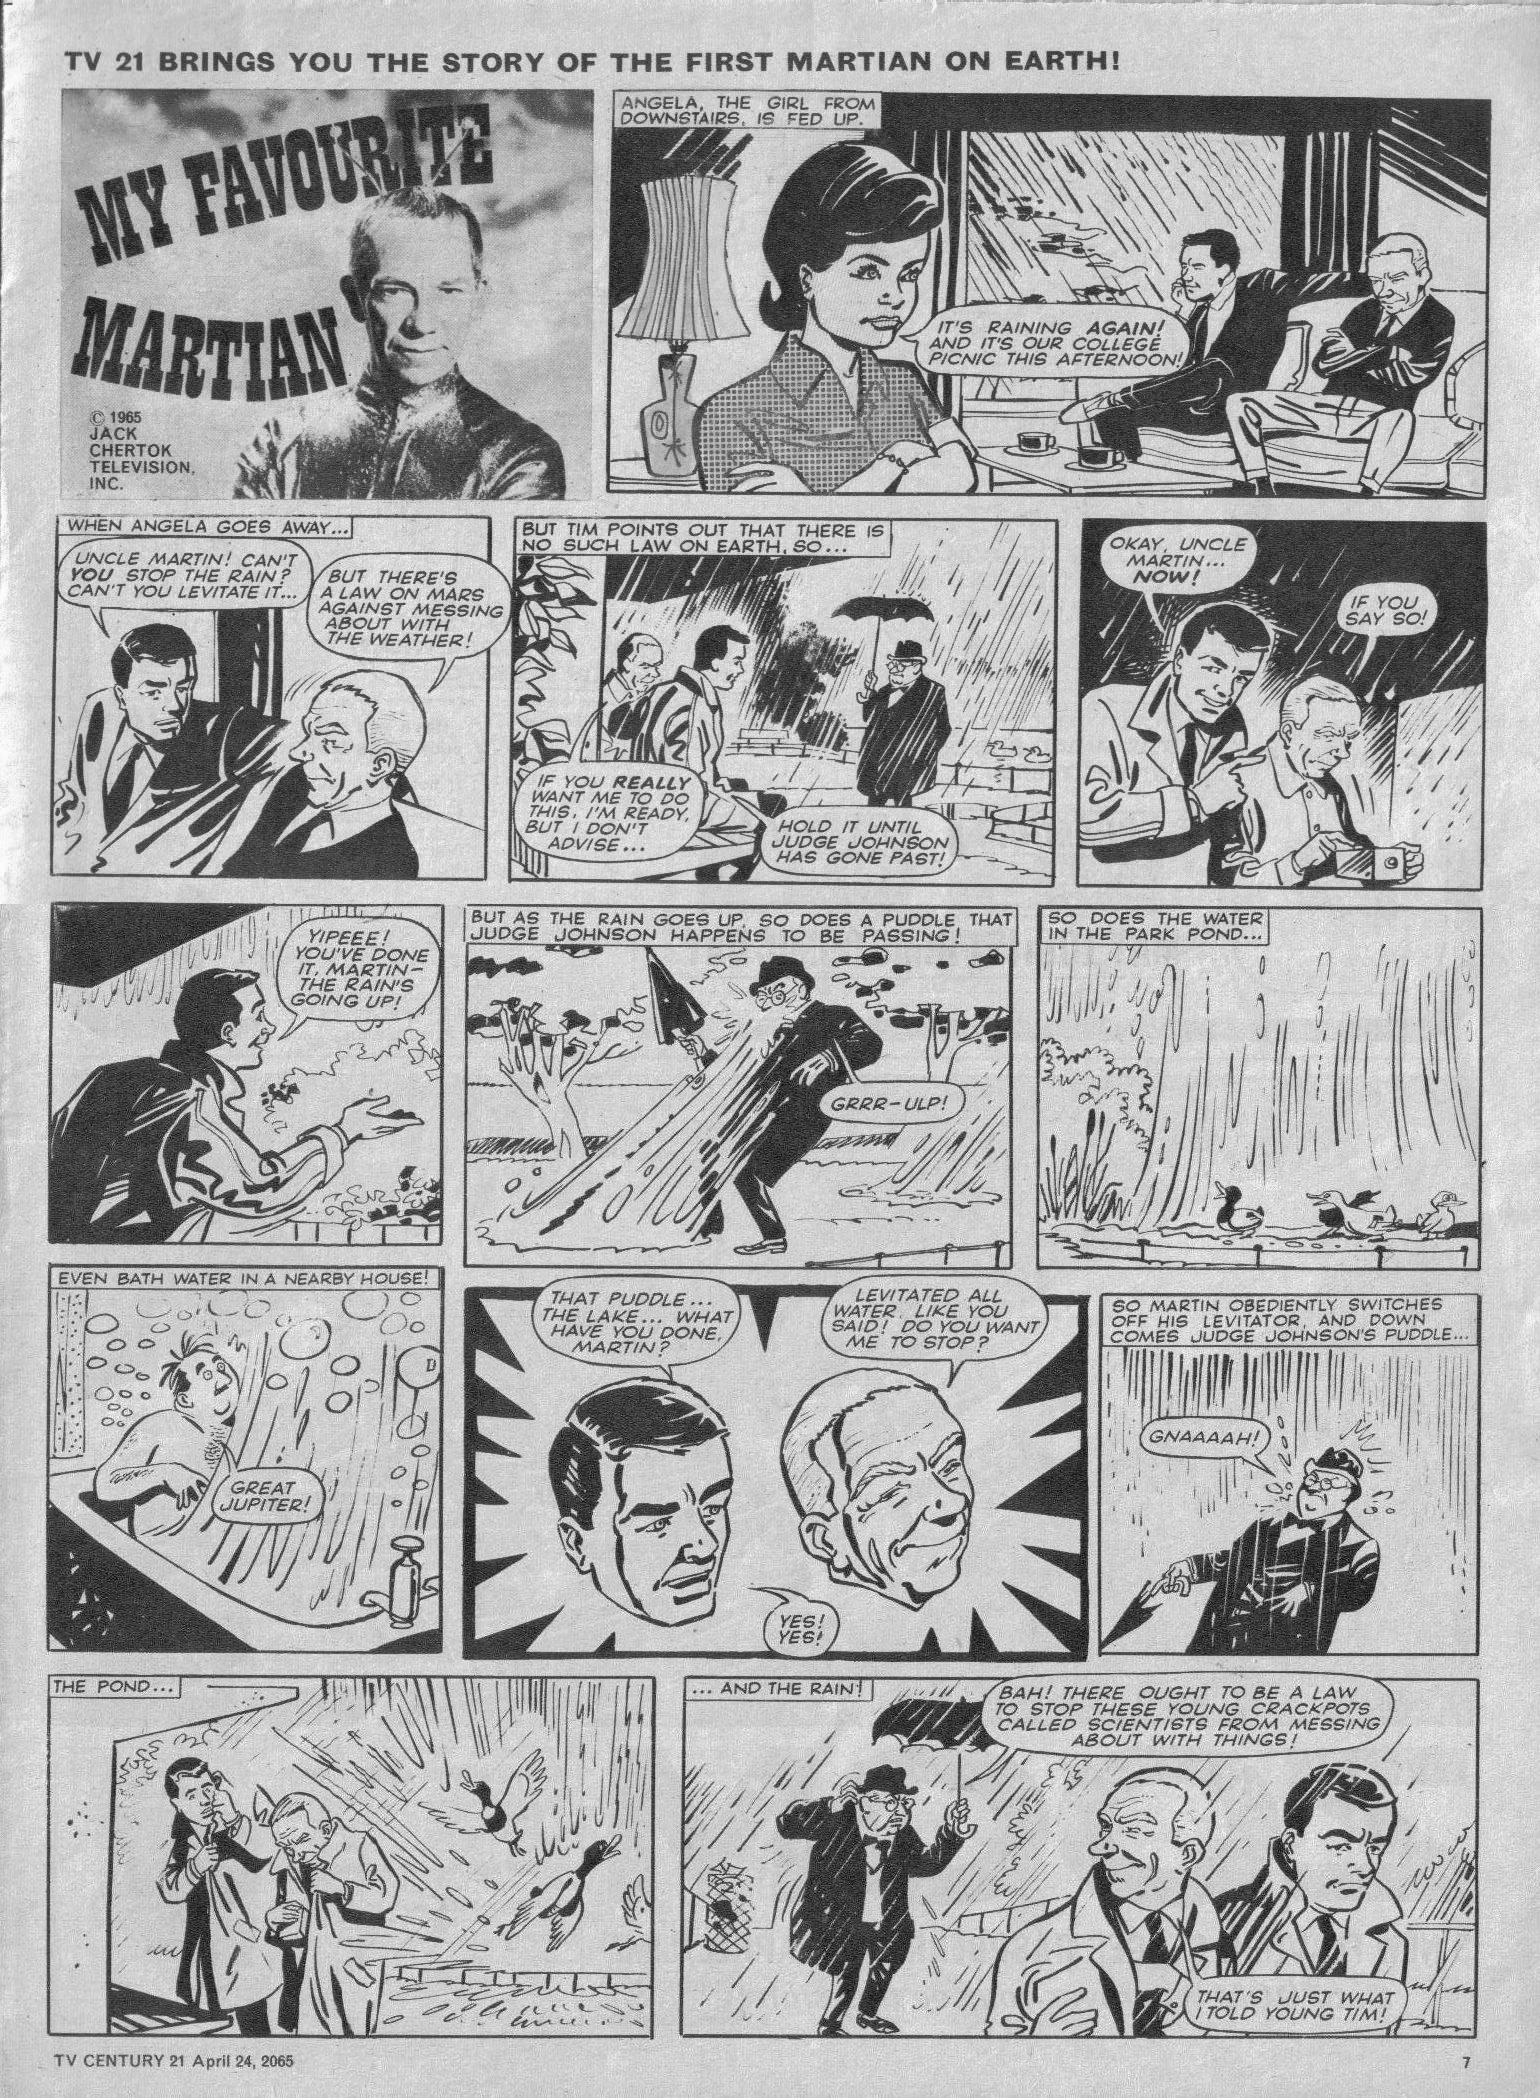 Read online TV Century 21 (TV 21) comic -  Issue #14 - 7